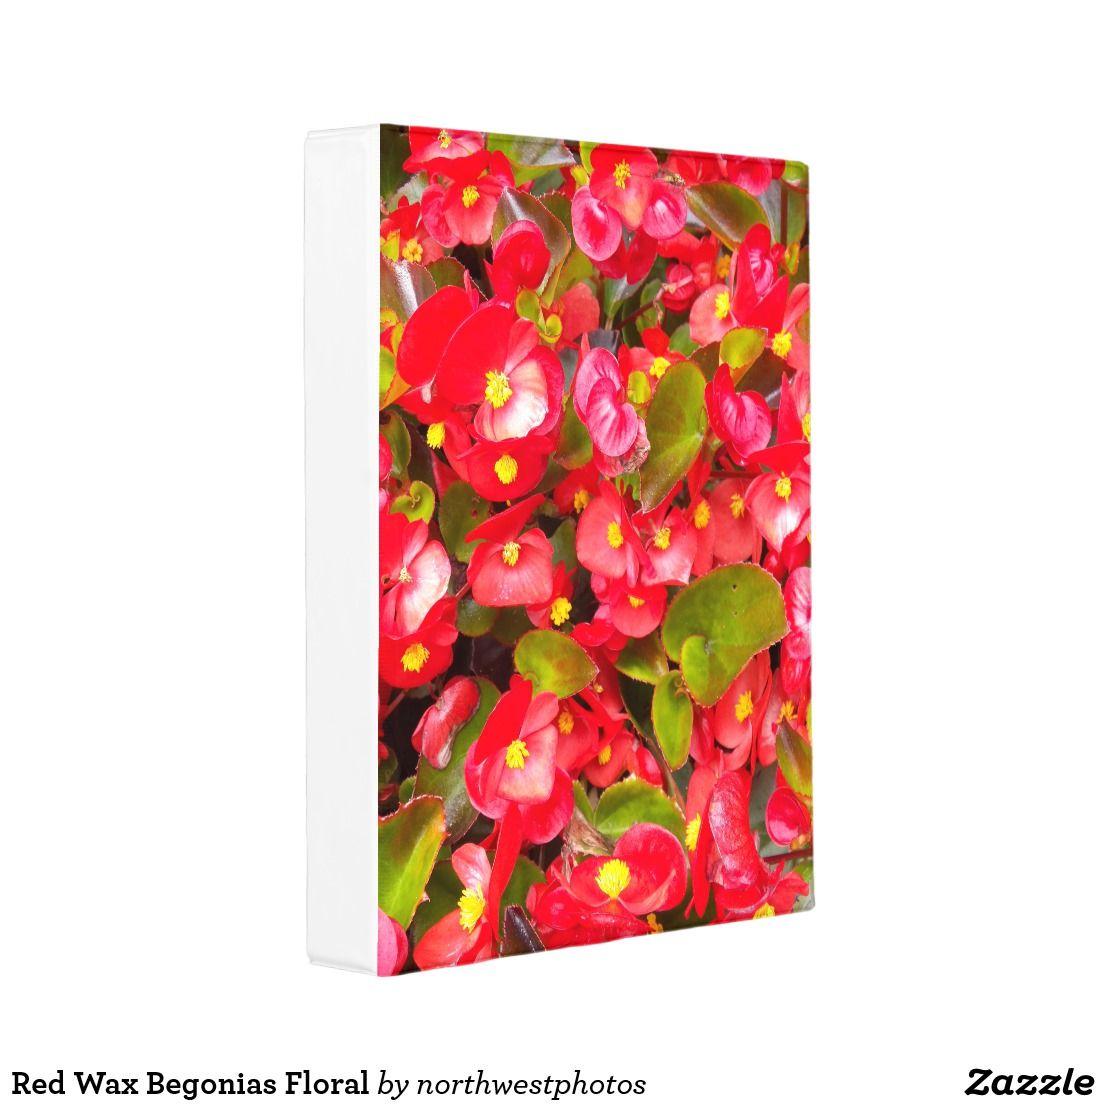 Red Wax Begonias Floral Photo Mini Binder